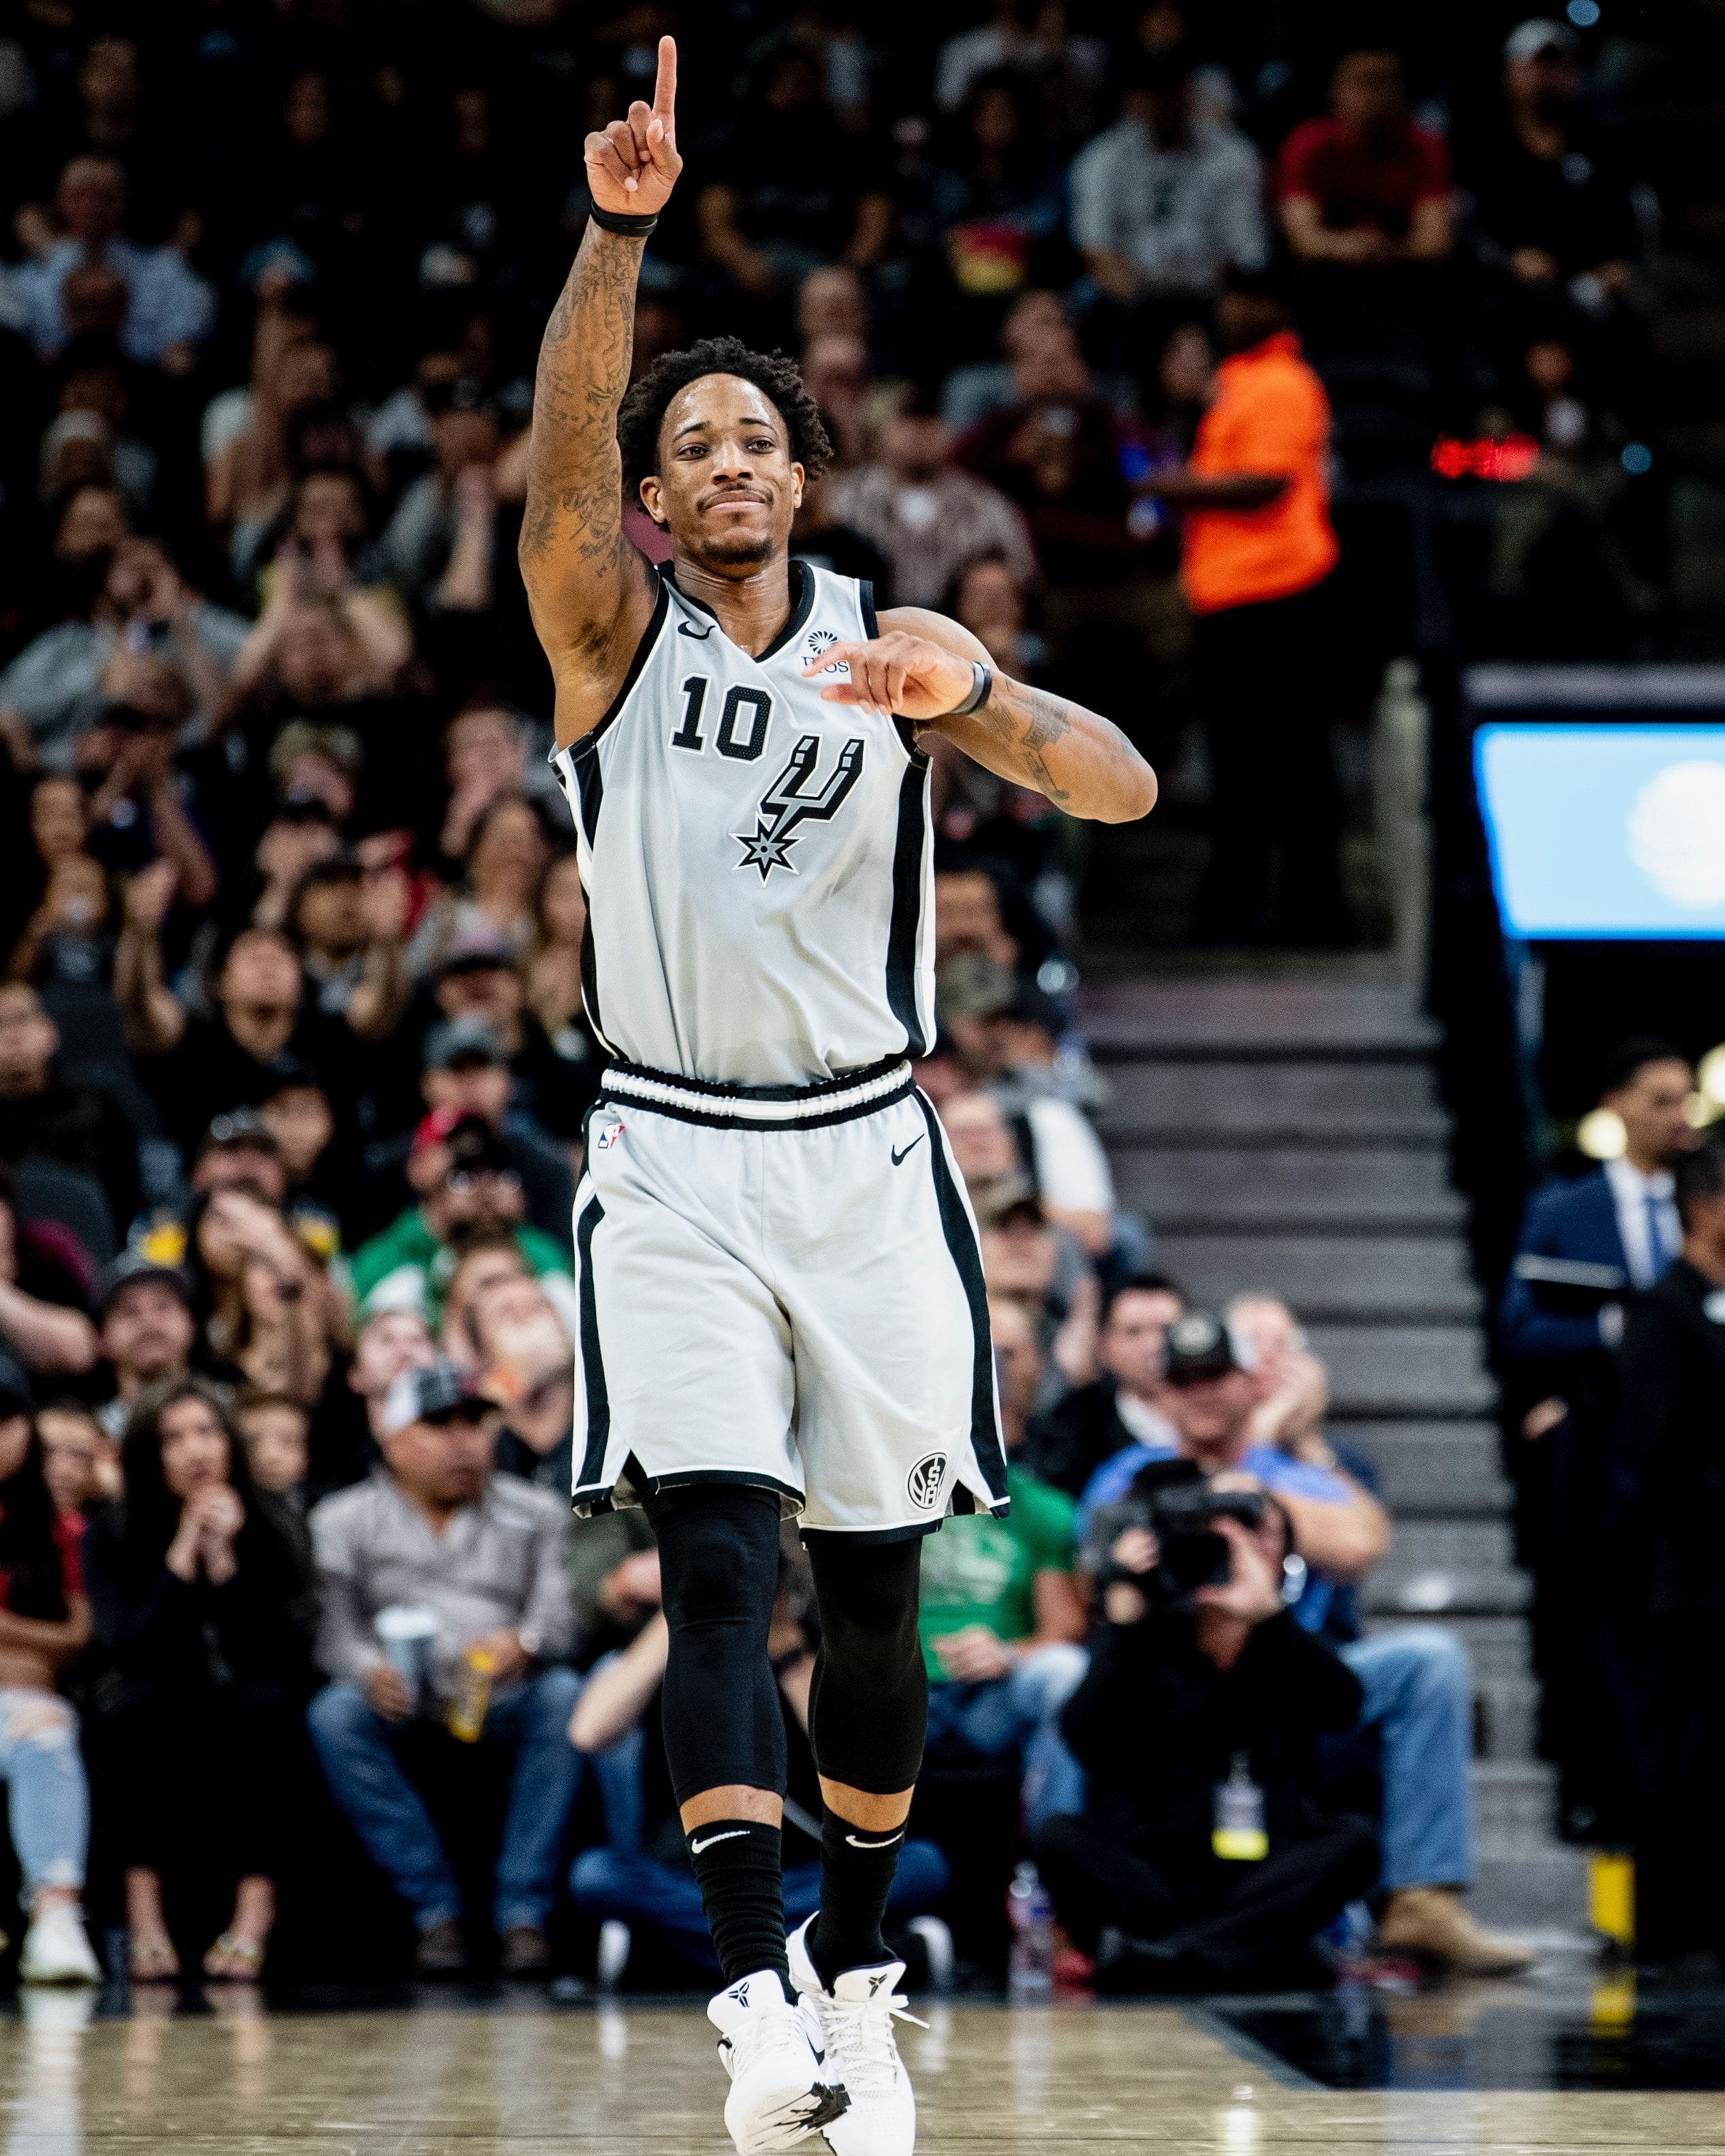 Photos Spurs vs. Celtics 11/9 San antonio spurs, Nba